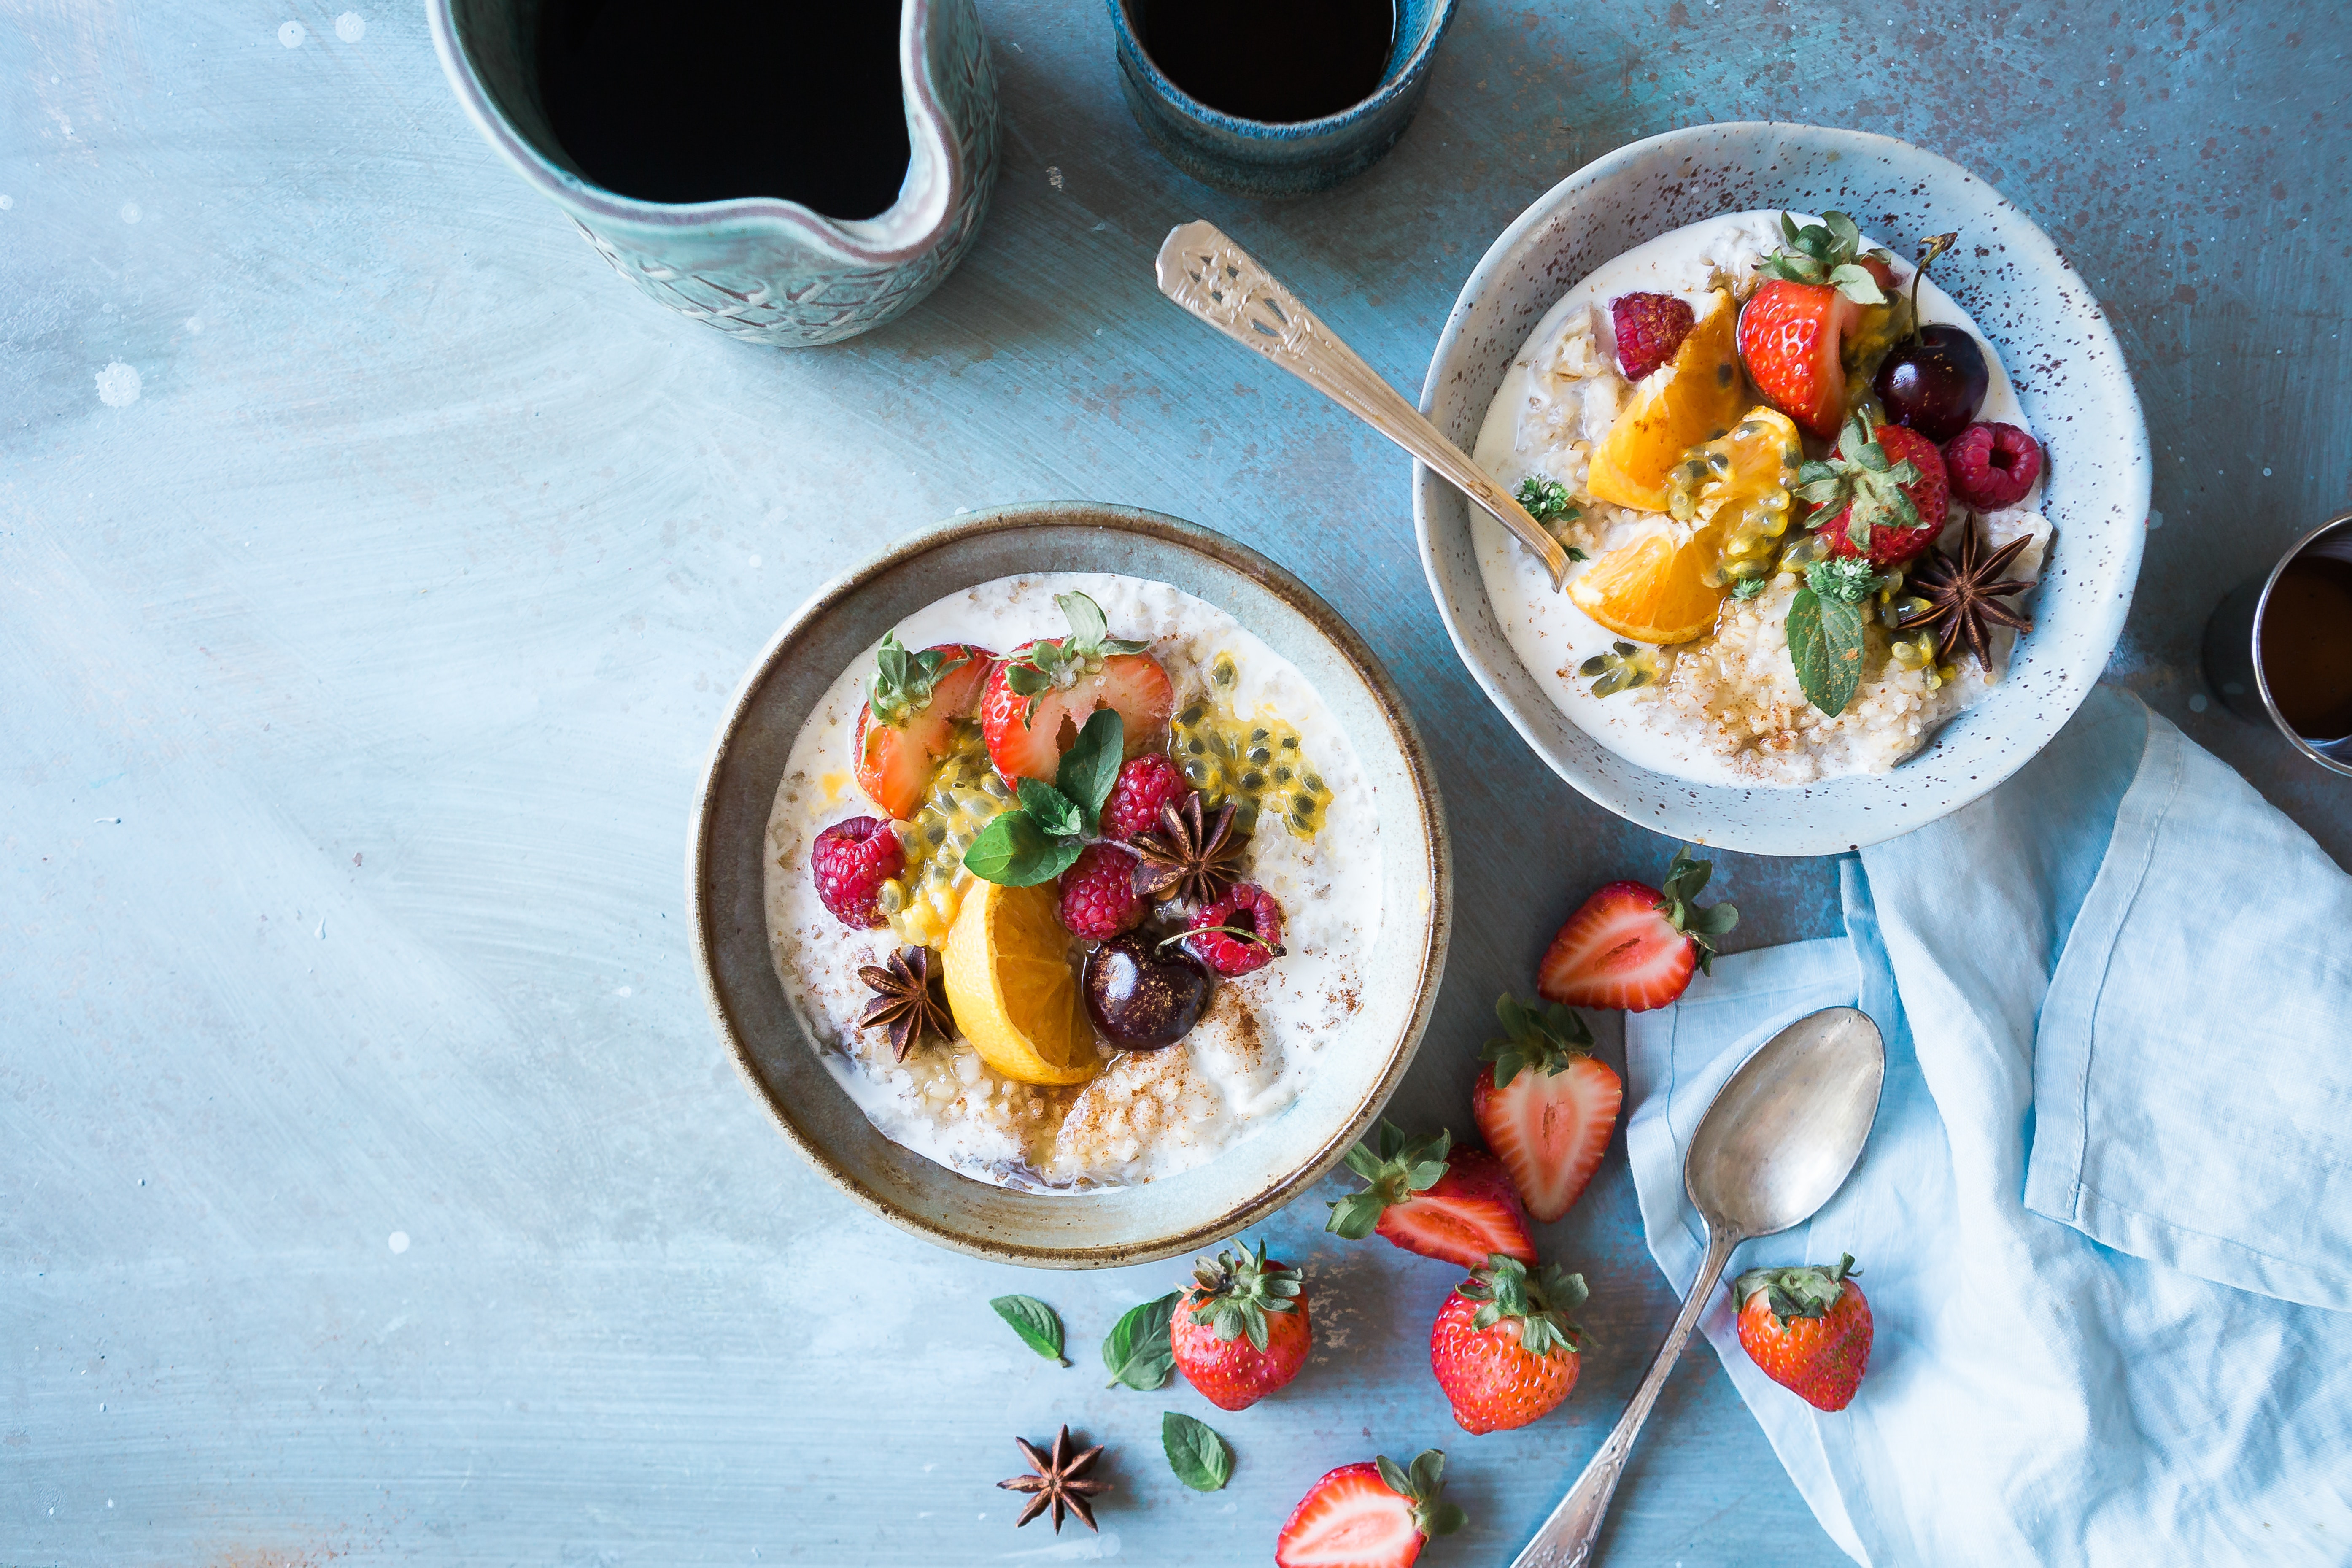 Holistic Nutrition Consultation